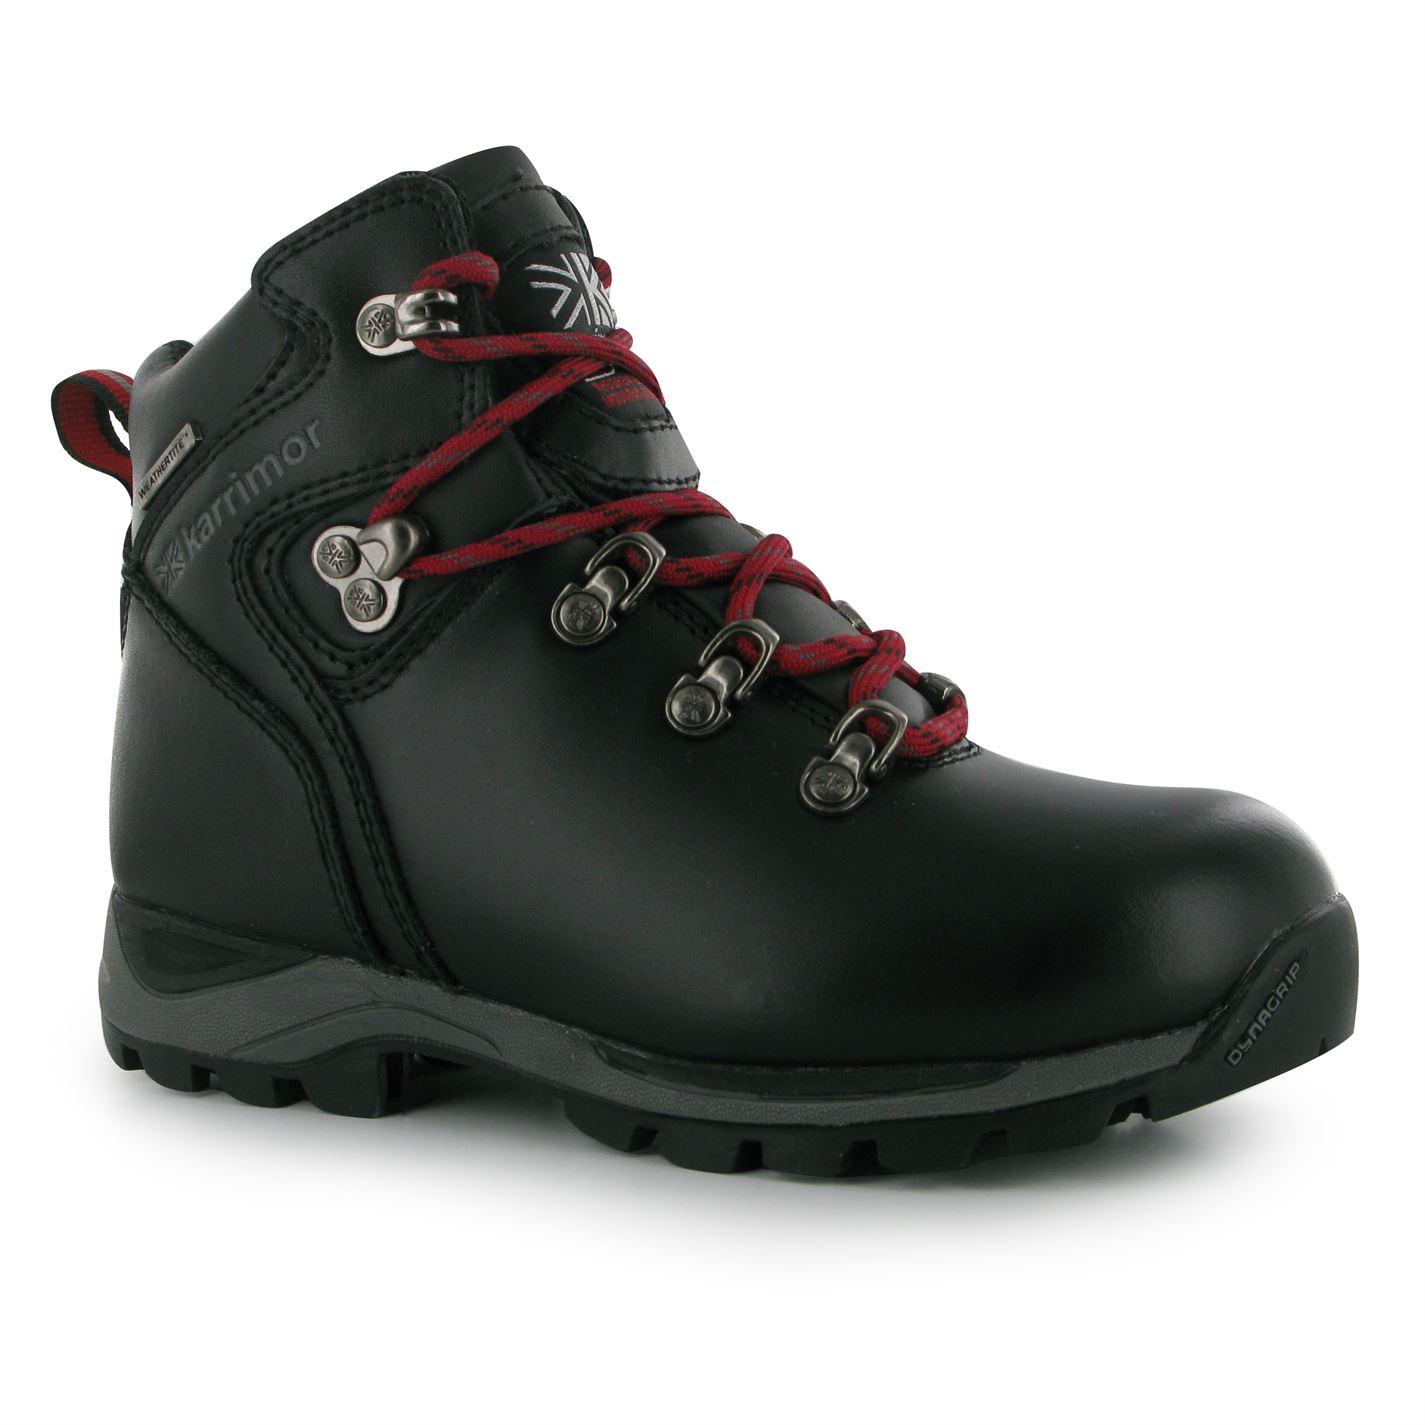 Karrimor Skido Childs Walking Boot - Glami.hu 77c997c3bc